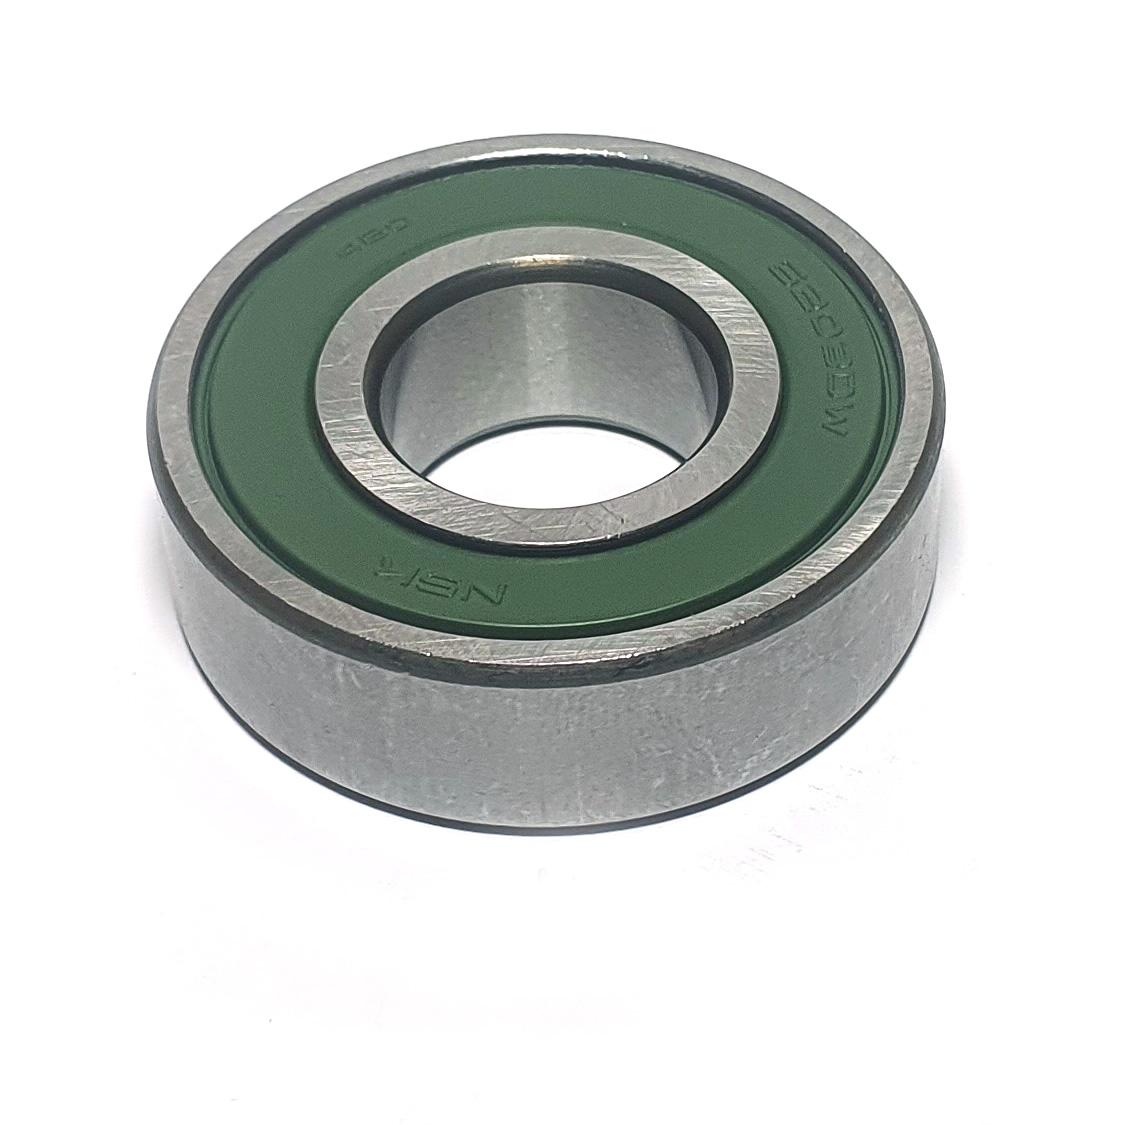 rolamento mitsubishi S16R-PTA2 - pn 32663-16200